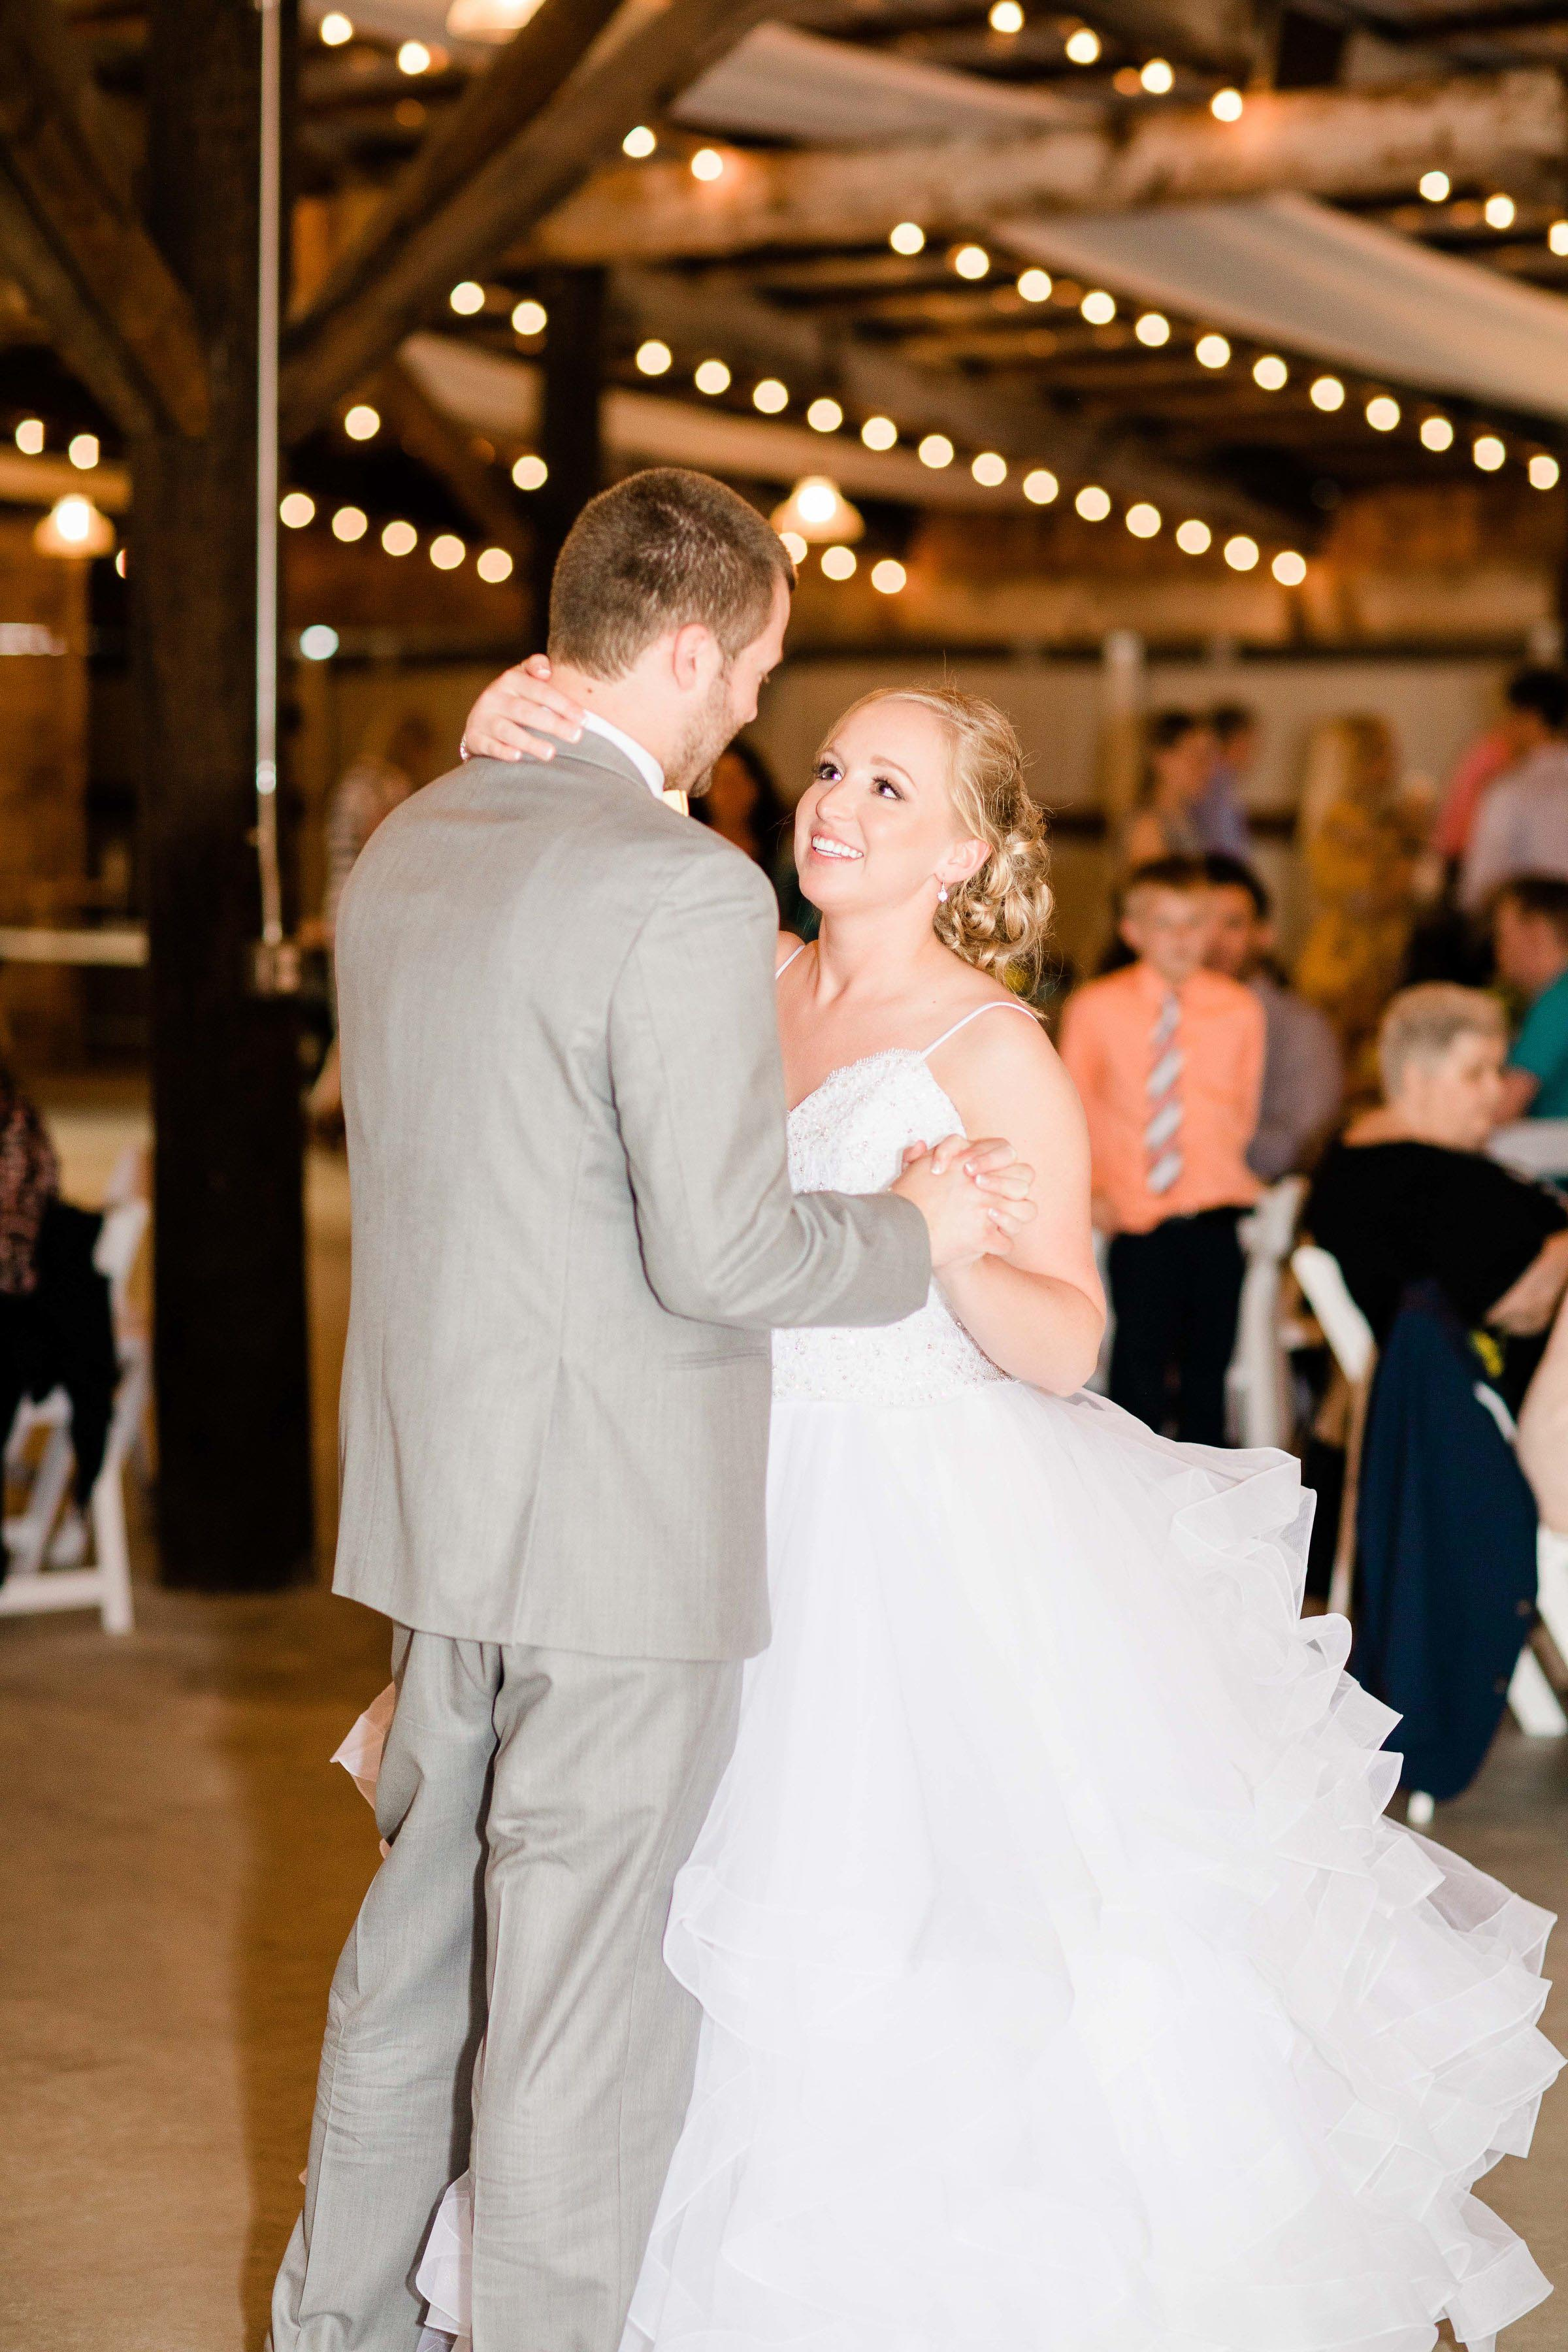 r buckeye barn southwest ohio wedding photographer-5.jpg